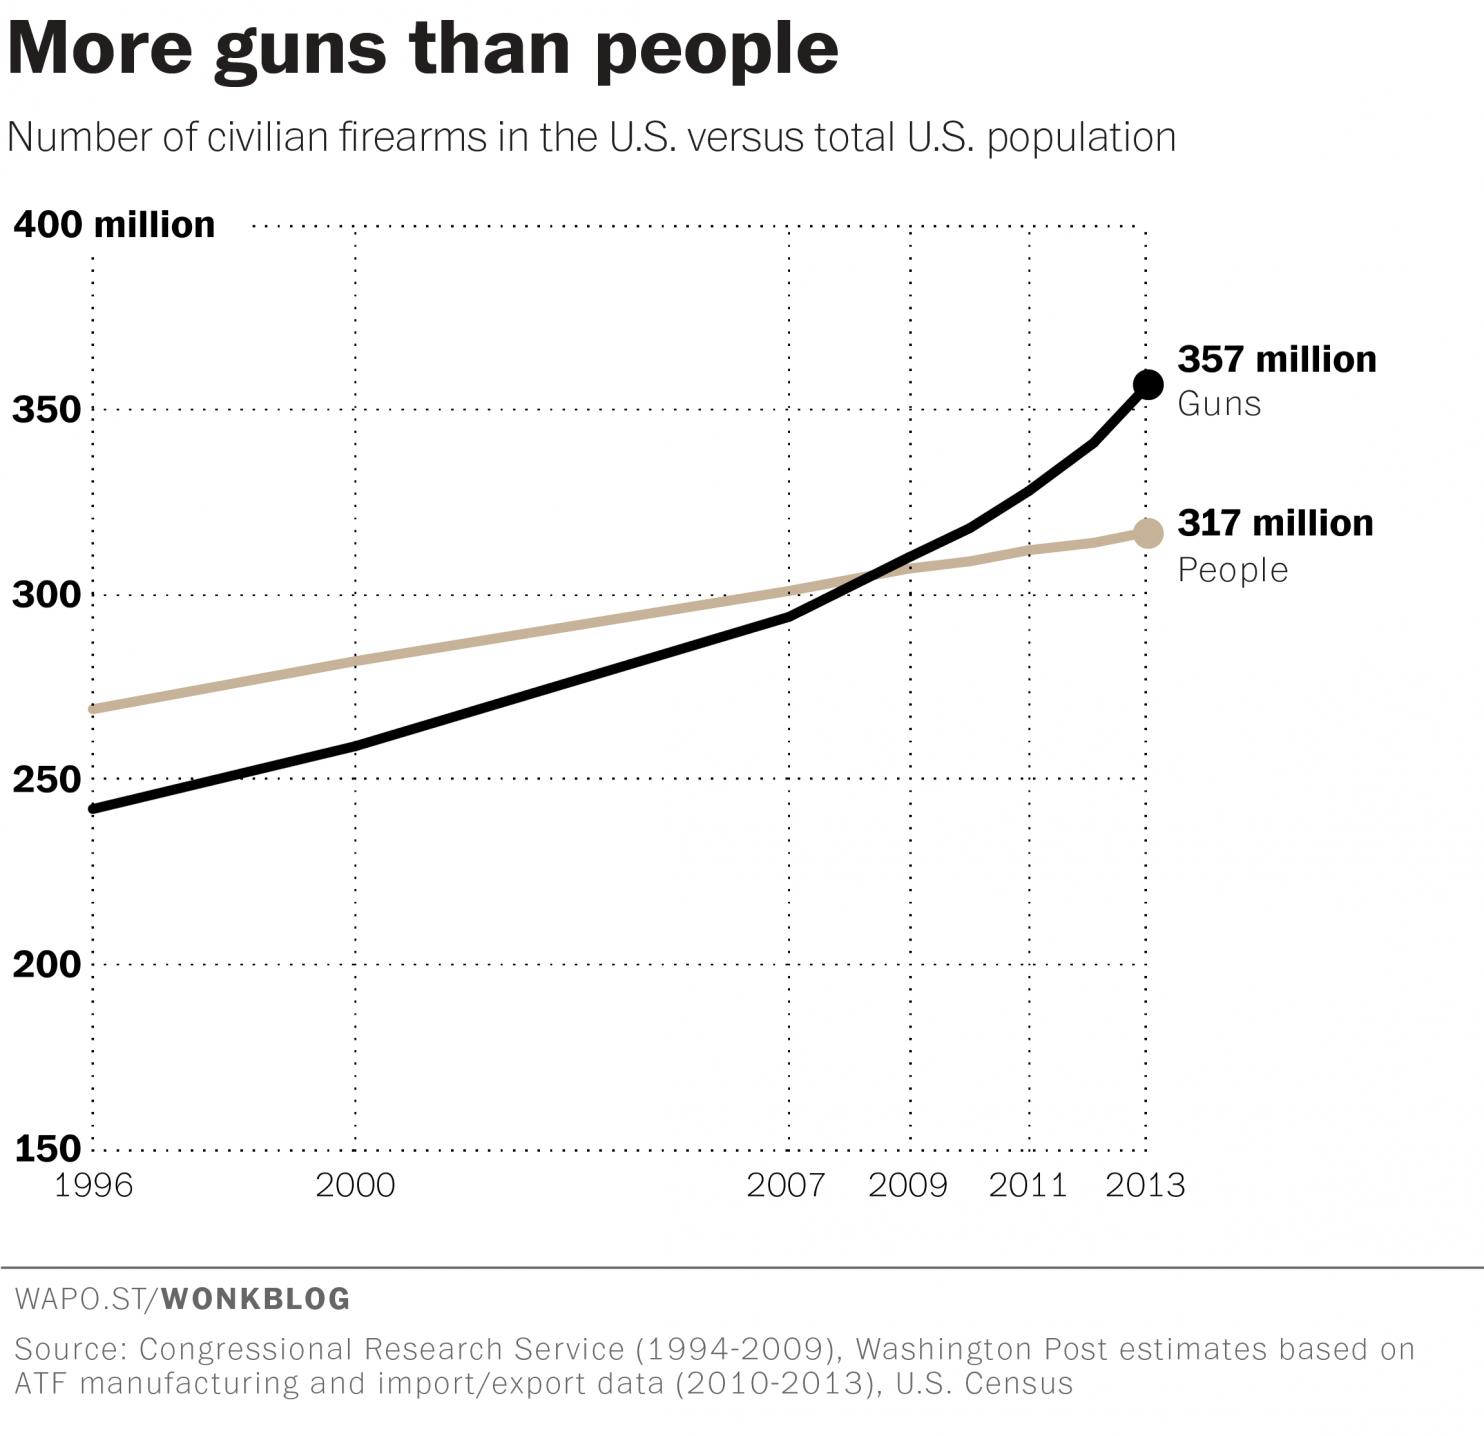 Number of guns